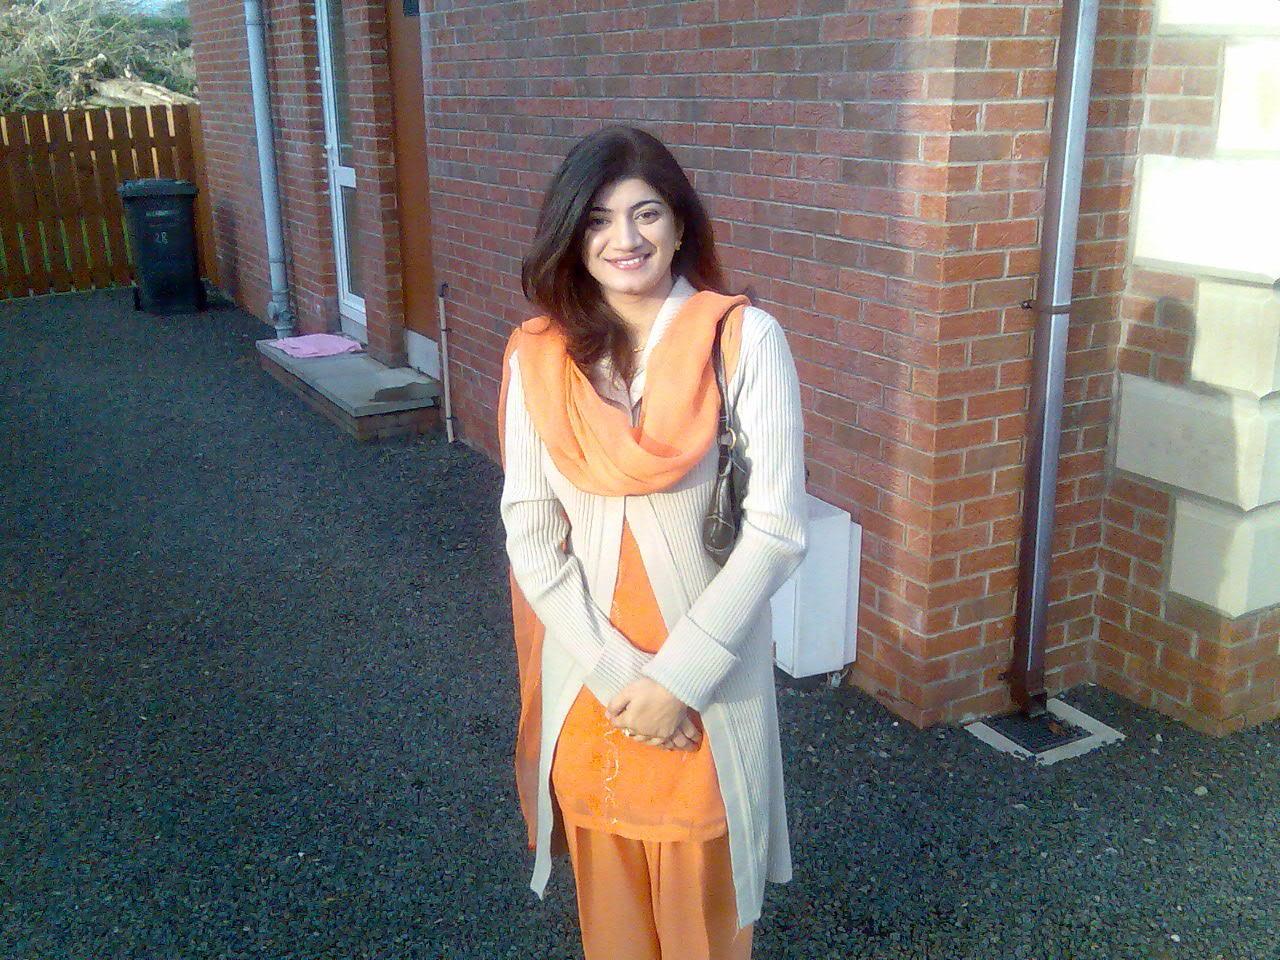 Desi Pakistani Girls In Hot Dresses